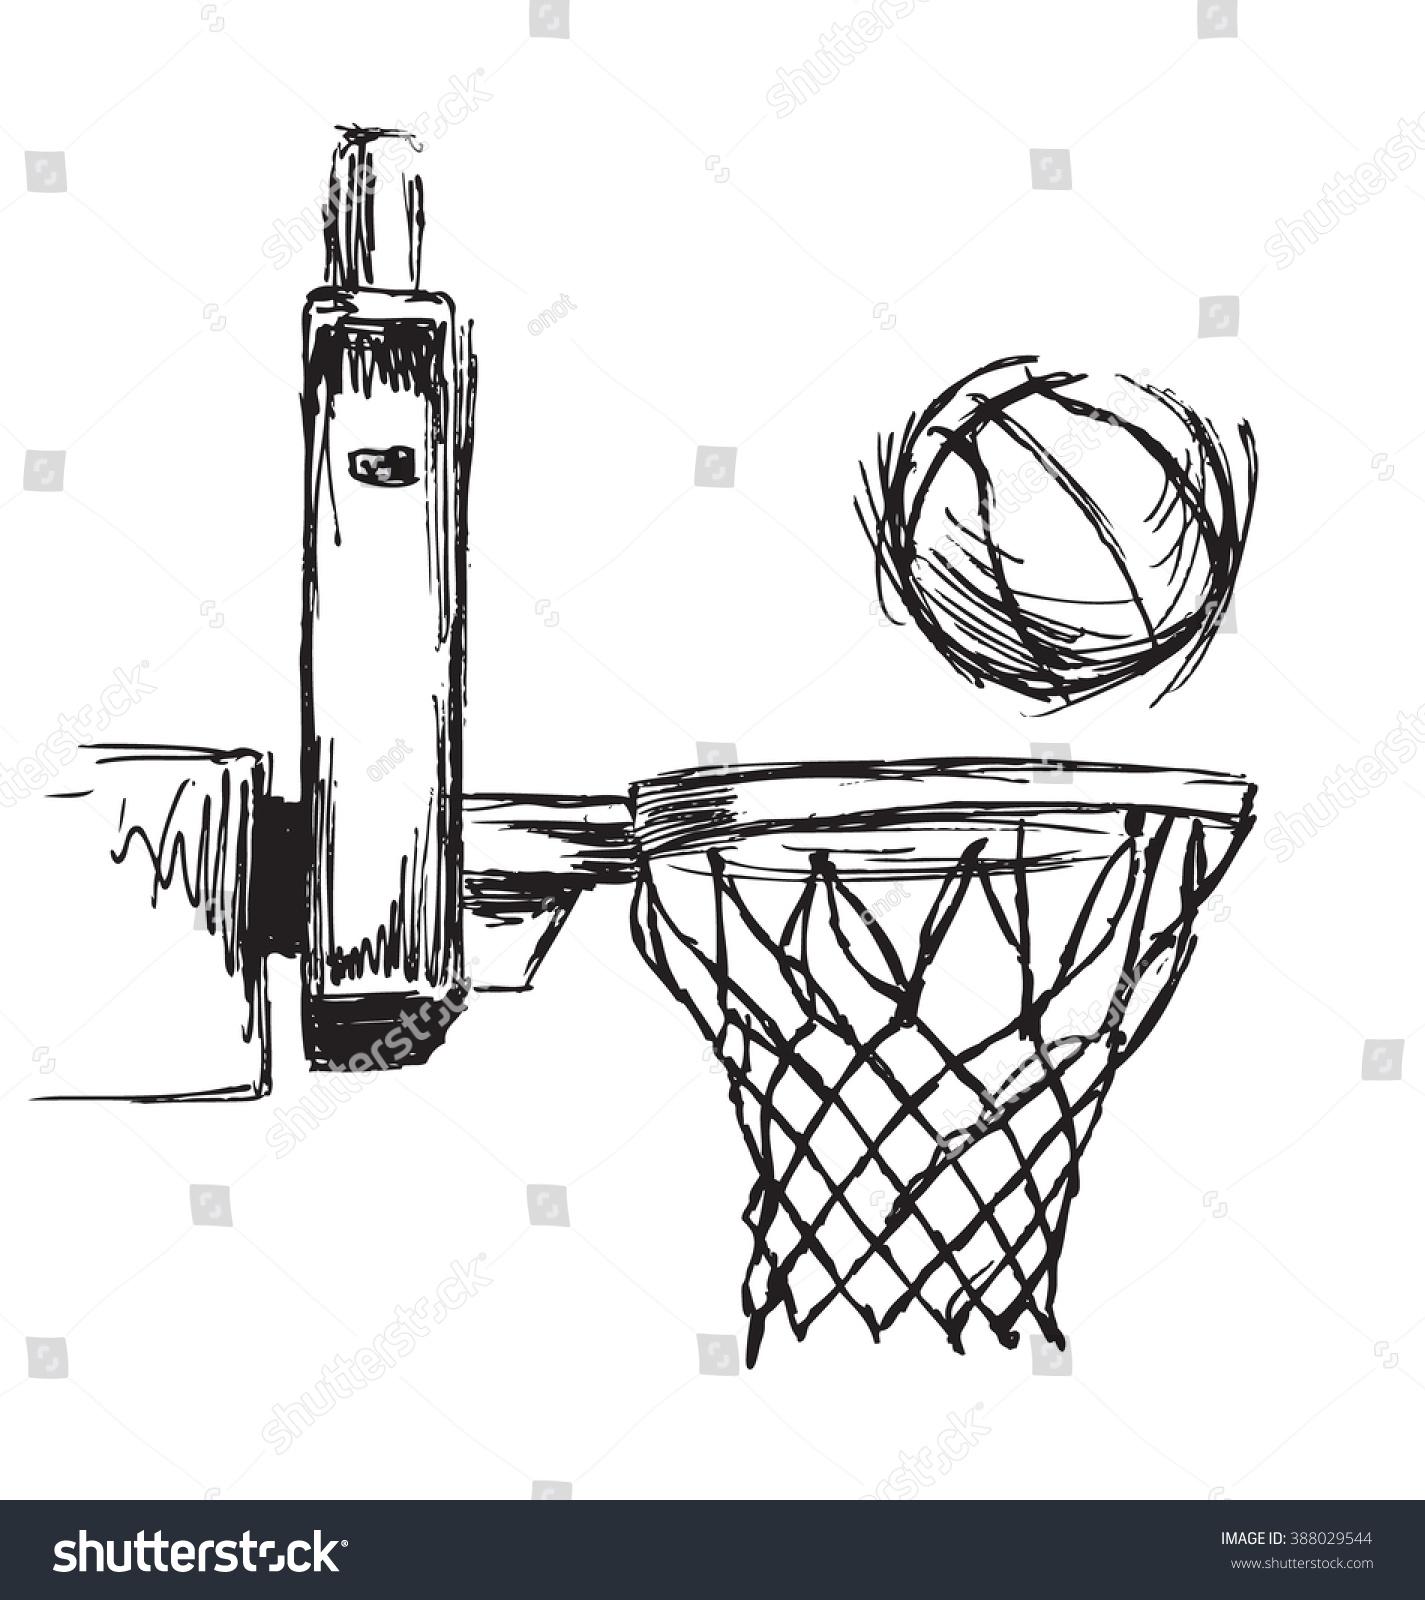 Hand Sketch Basketball Hoop And Ball Stock Vector Illustration 388029544  Shutterstock